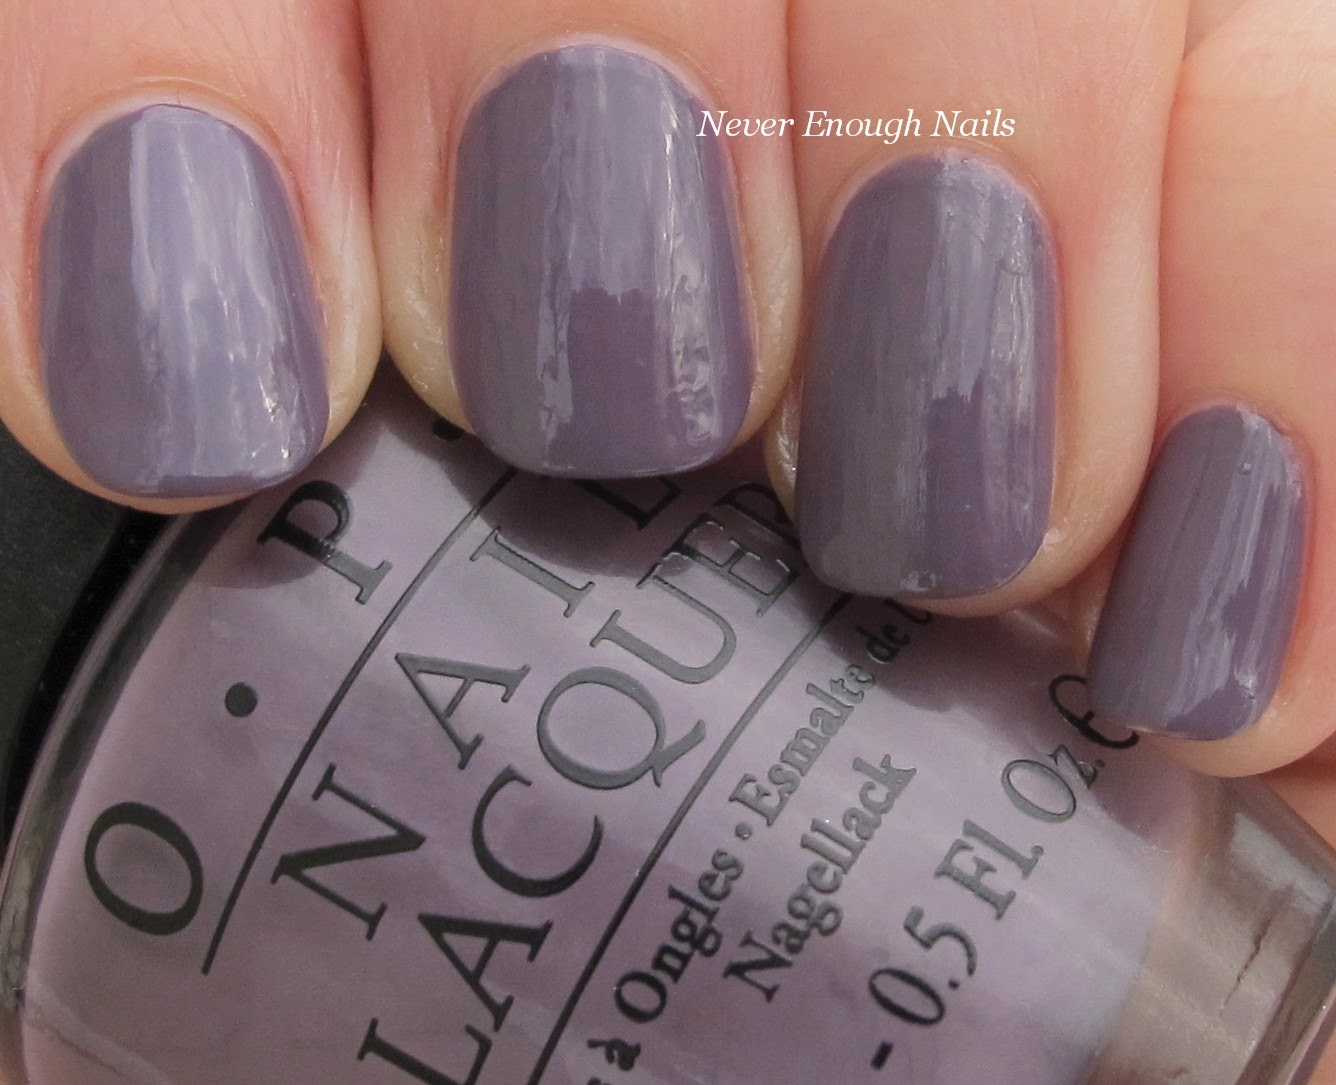 Never Enough Nails: OPI Hawaii- 3 Very A-Peeling Polishes!